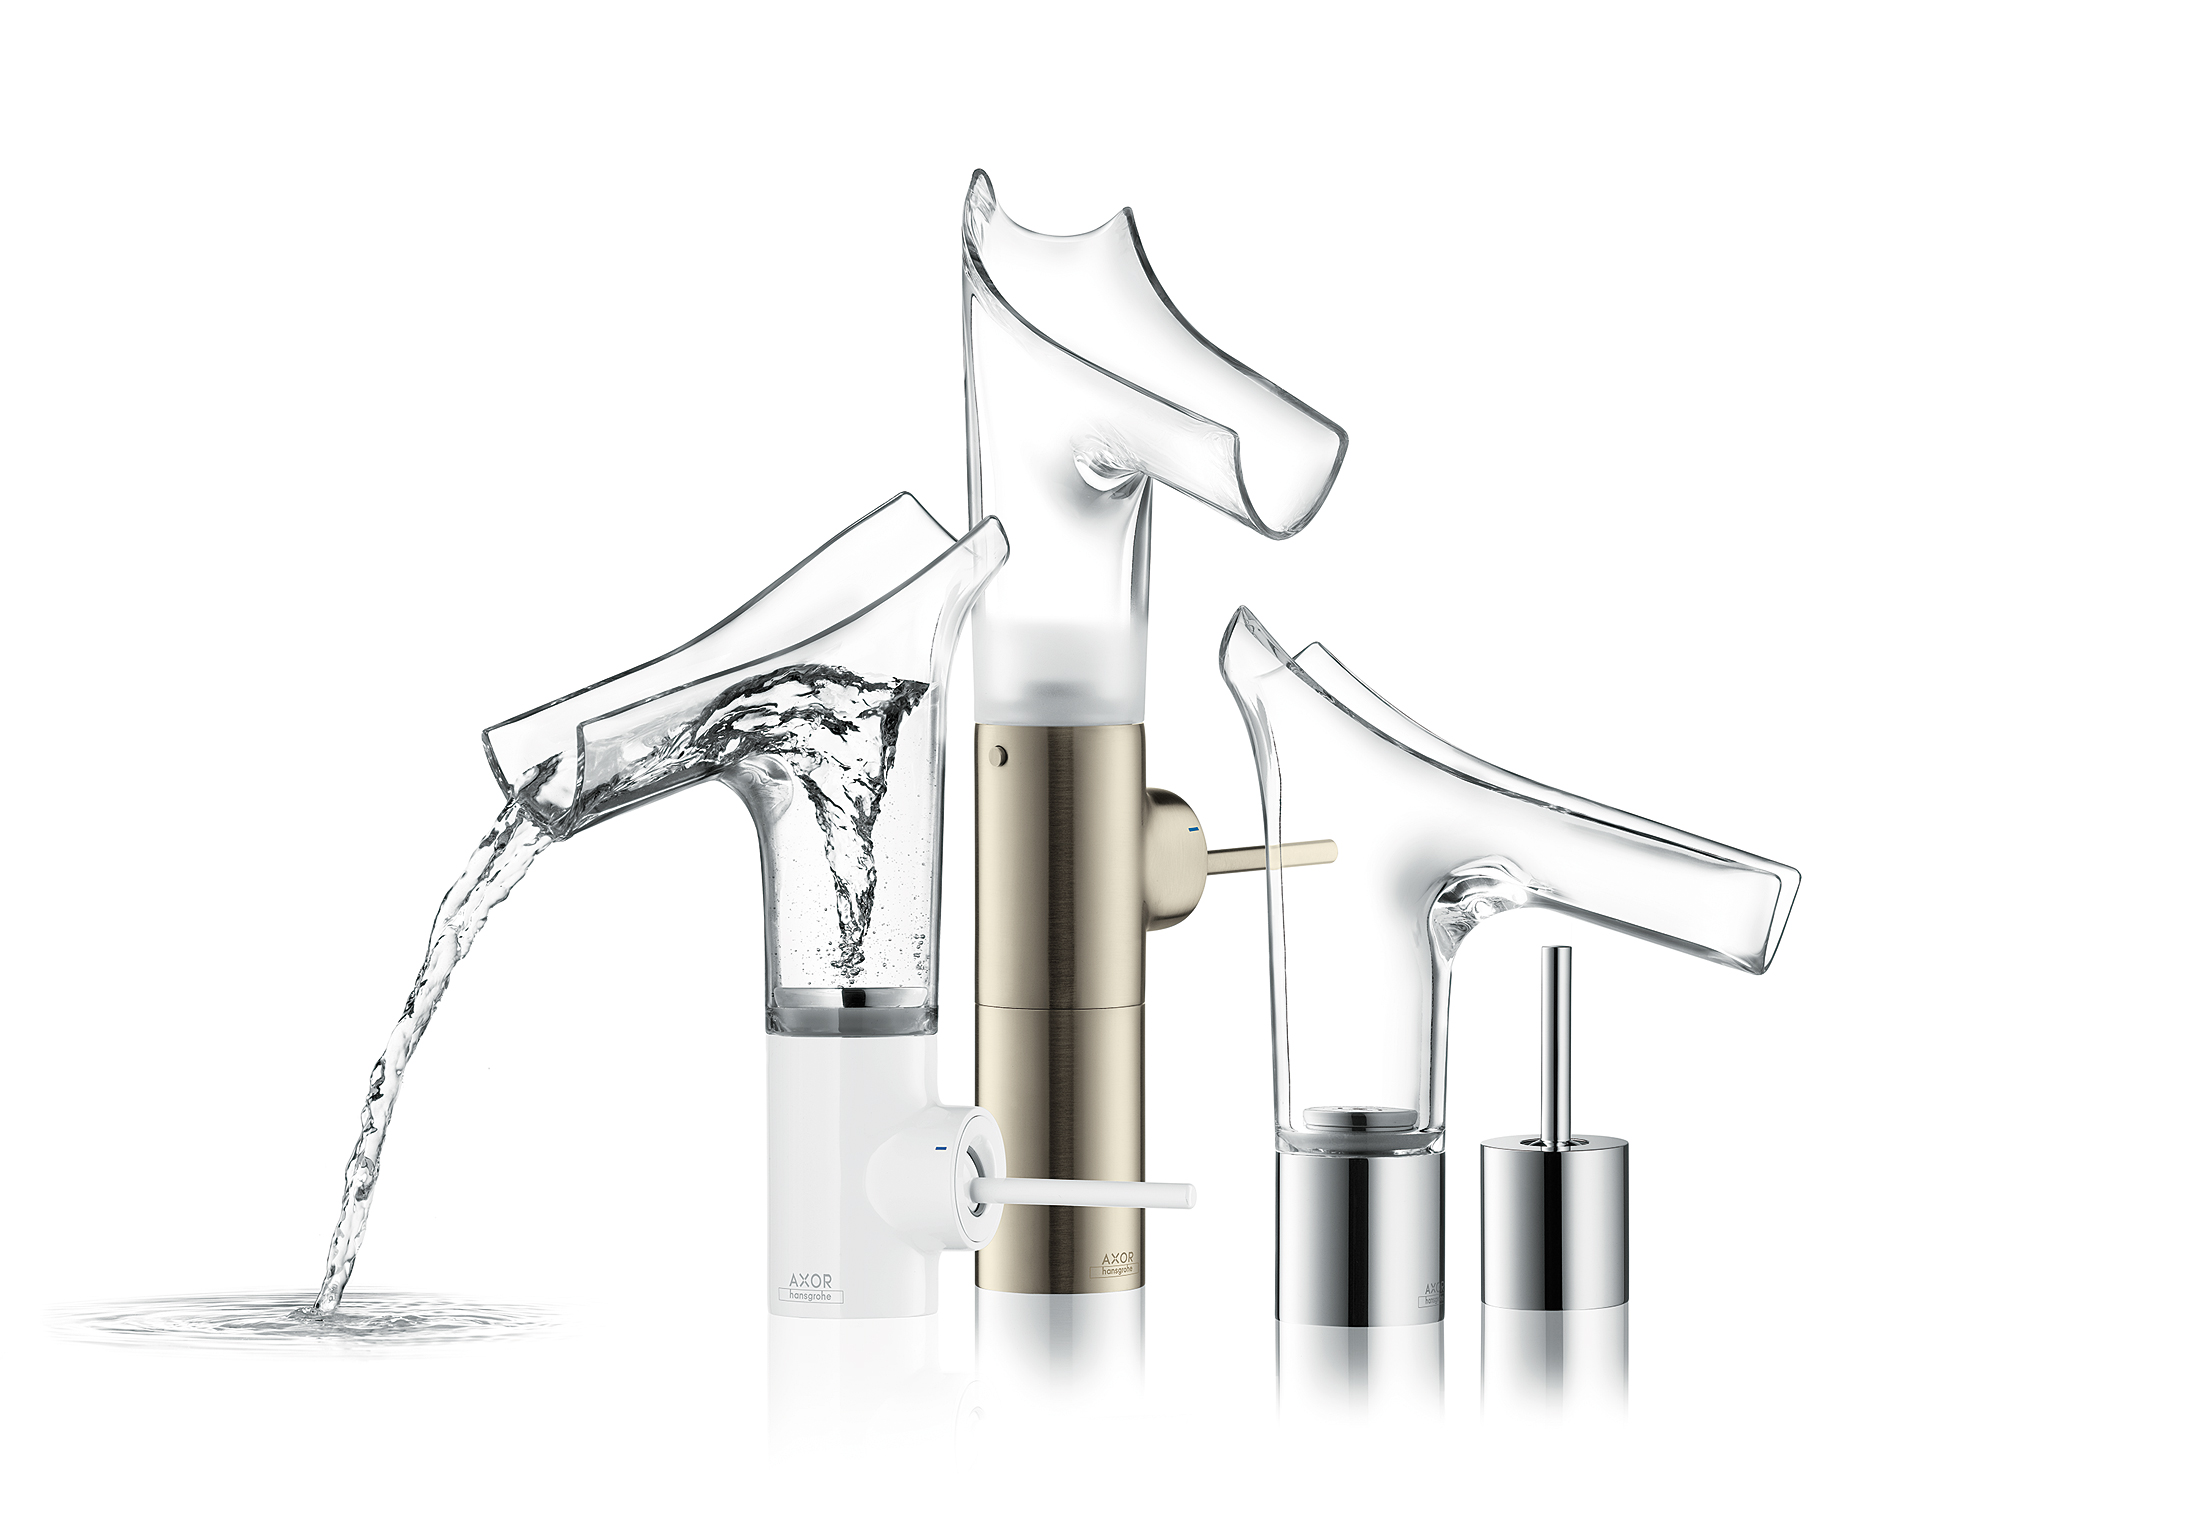 Glazen design wastafelmengkraan van Philippe Starck - Axor Starck V